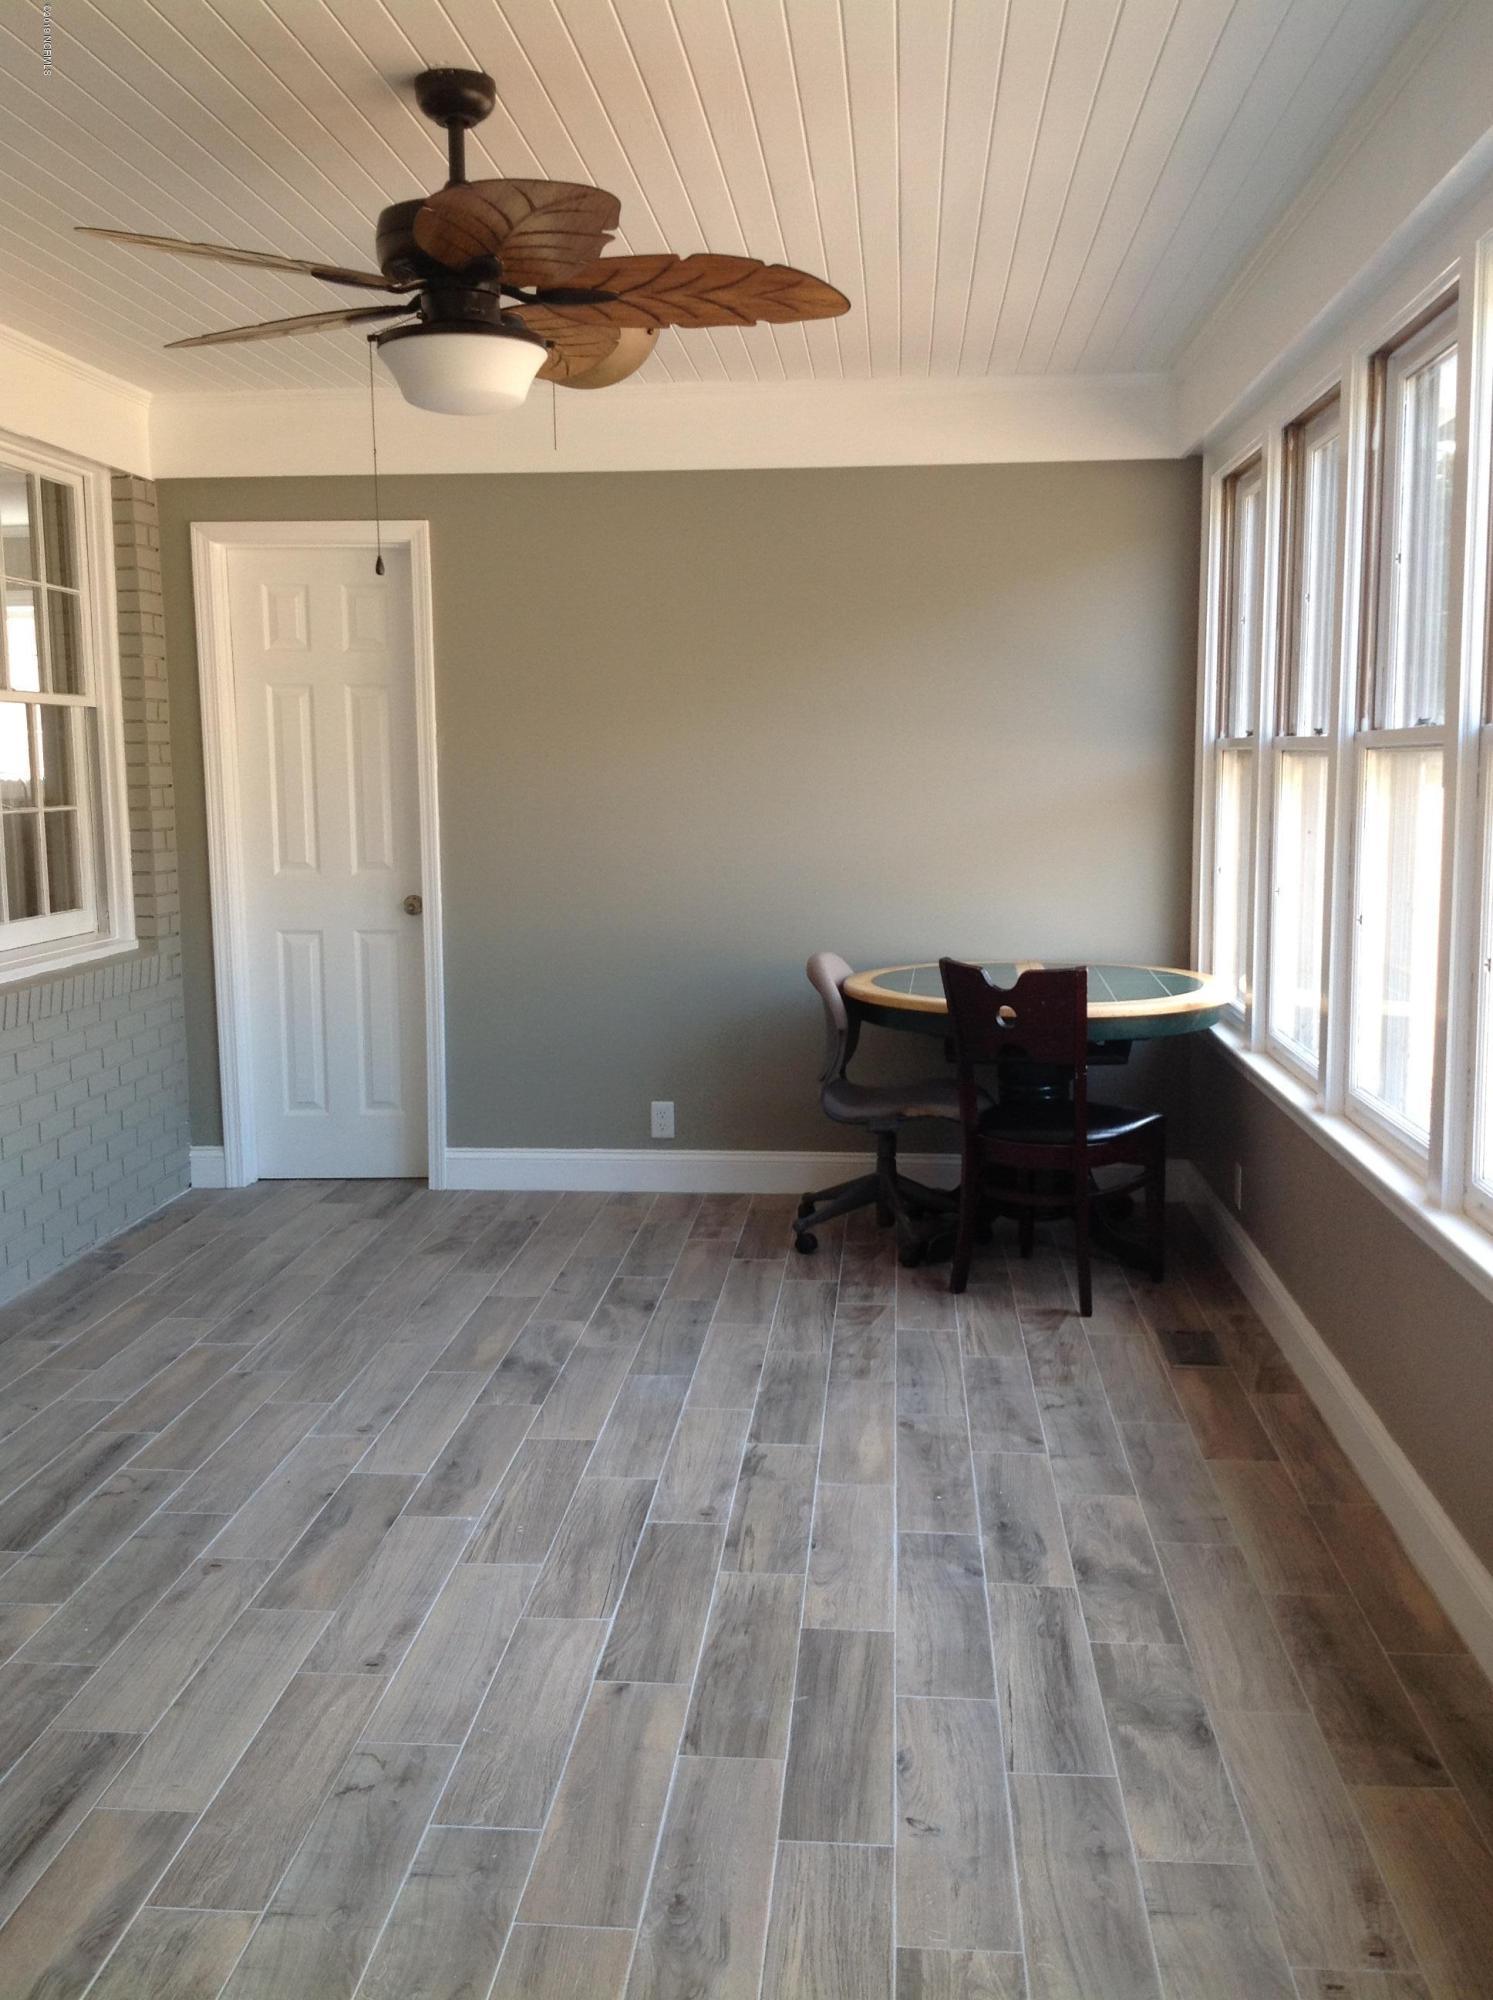 3811 Edgewood Road, Wilmington, North Carolina 28403, 4 Bedrooms Bedrooms, 9 Rooms Rooms,4 BathroomsBathrooms,Single family residence,For sale,Edgewood,100277477